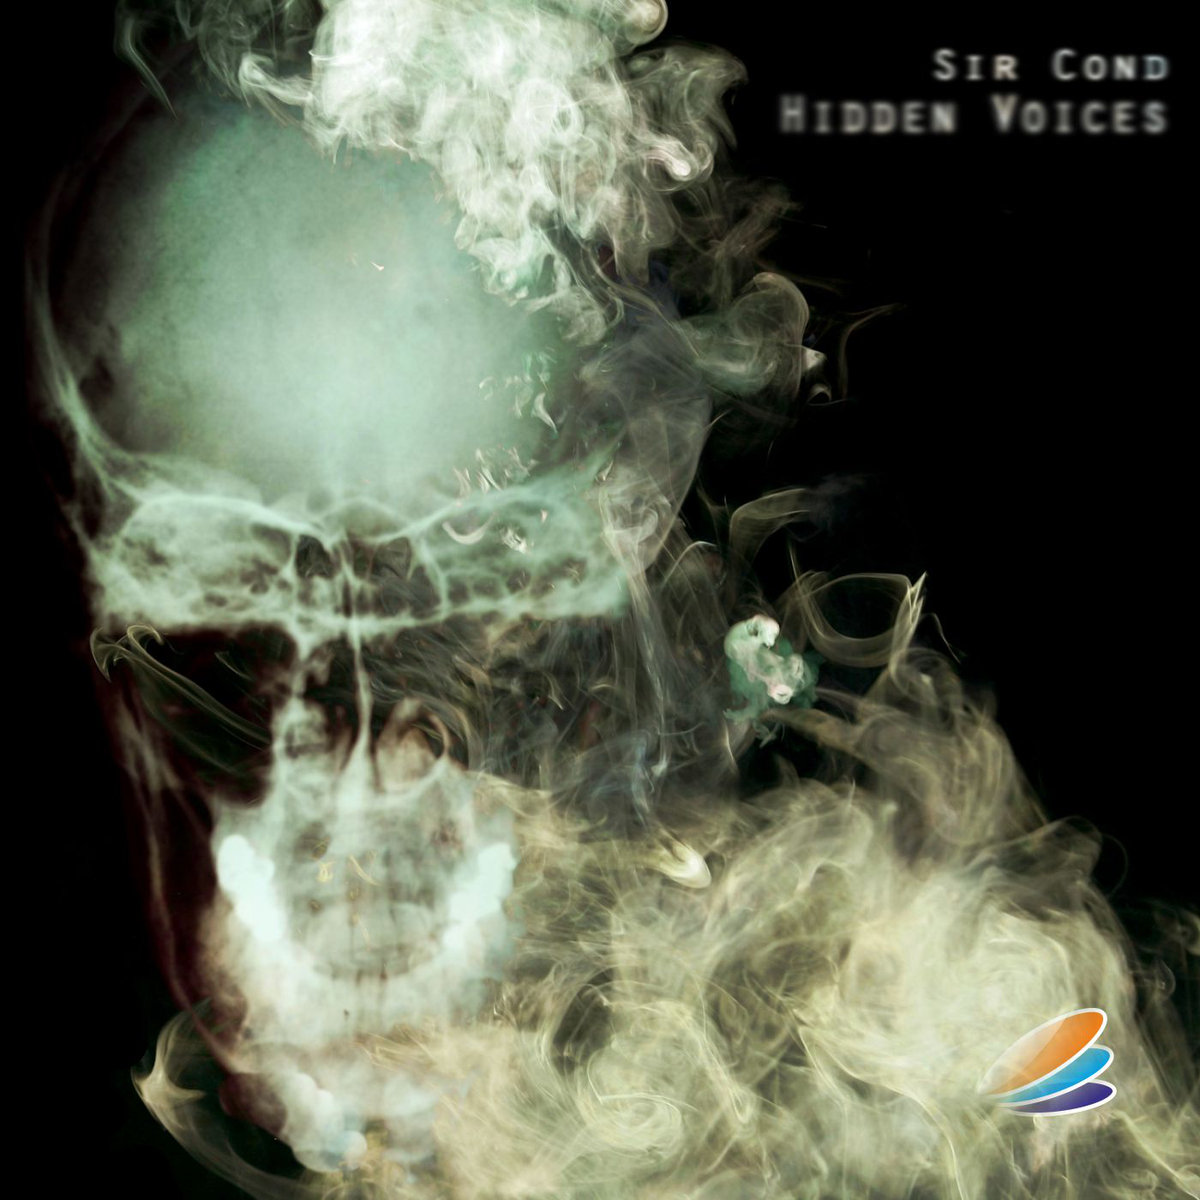 Sir Cond - Hidden Voices